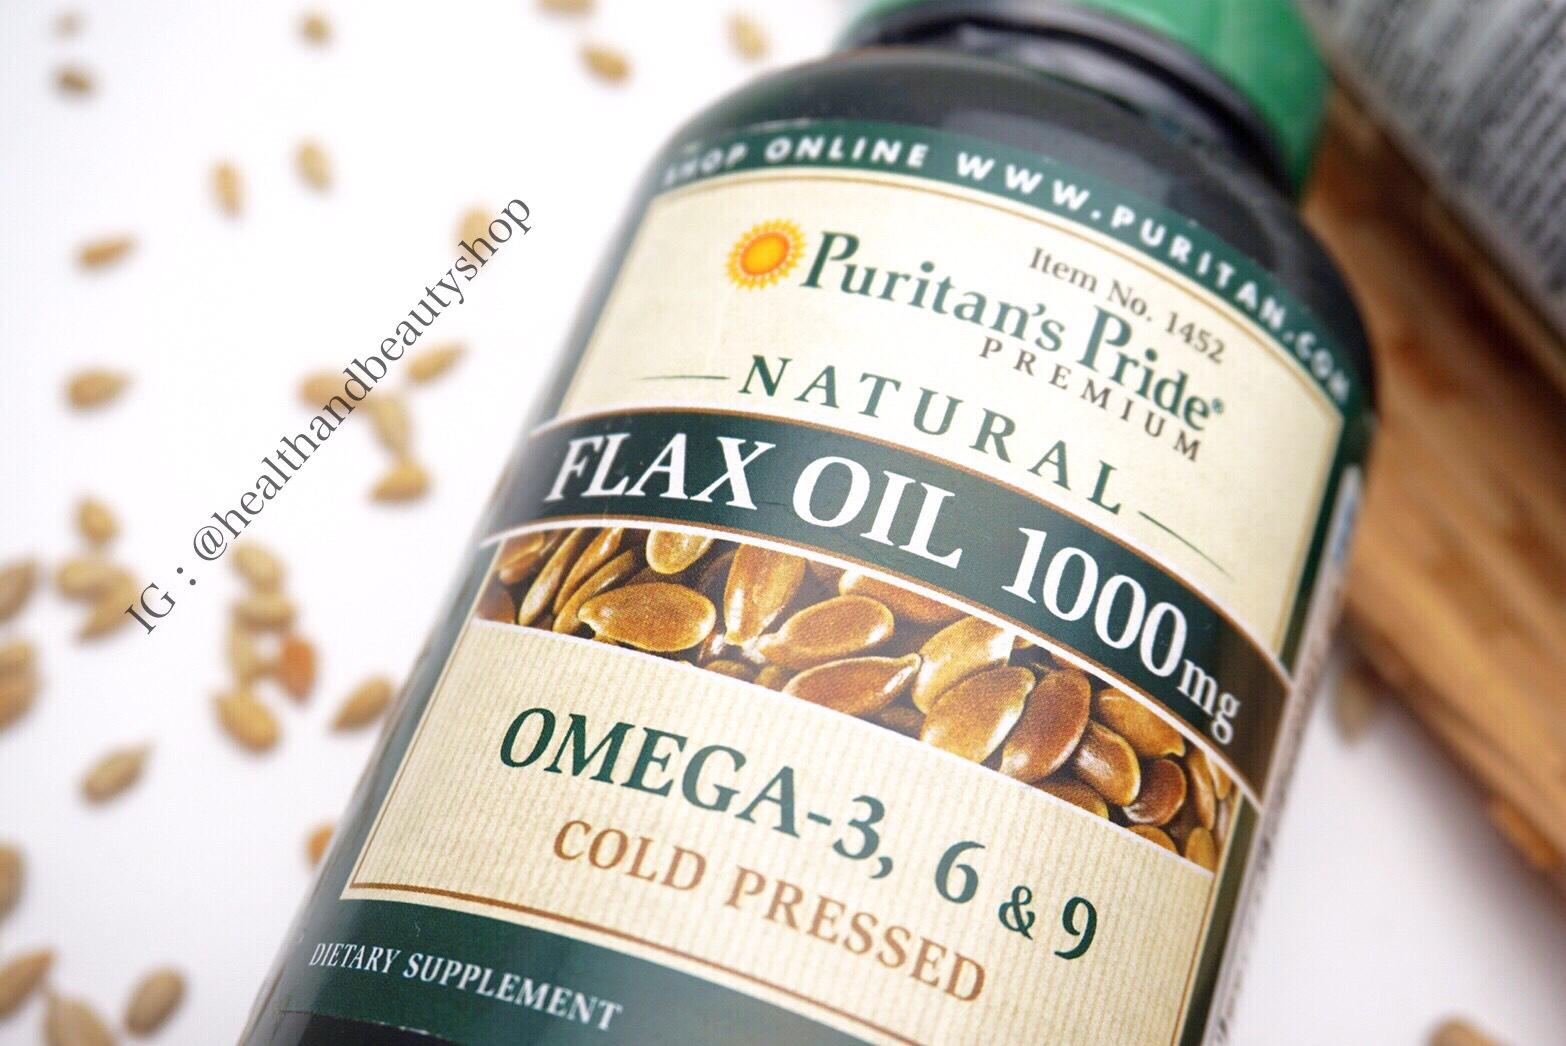 Puritan's Pride Natural Flax Oil 1000 mg 120 Softgels